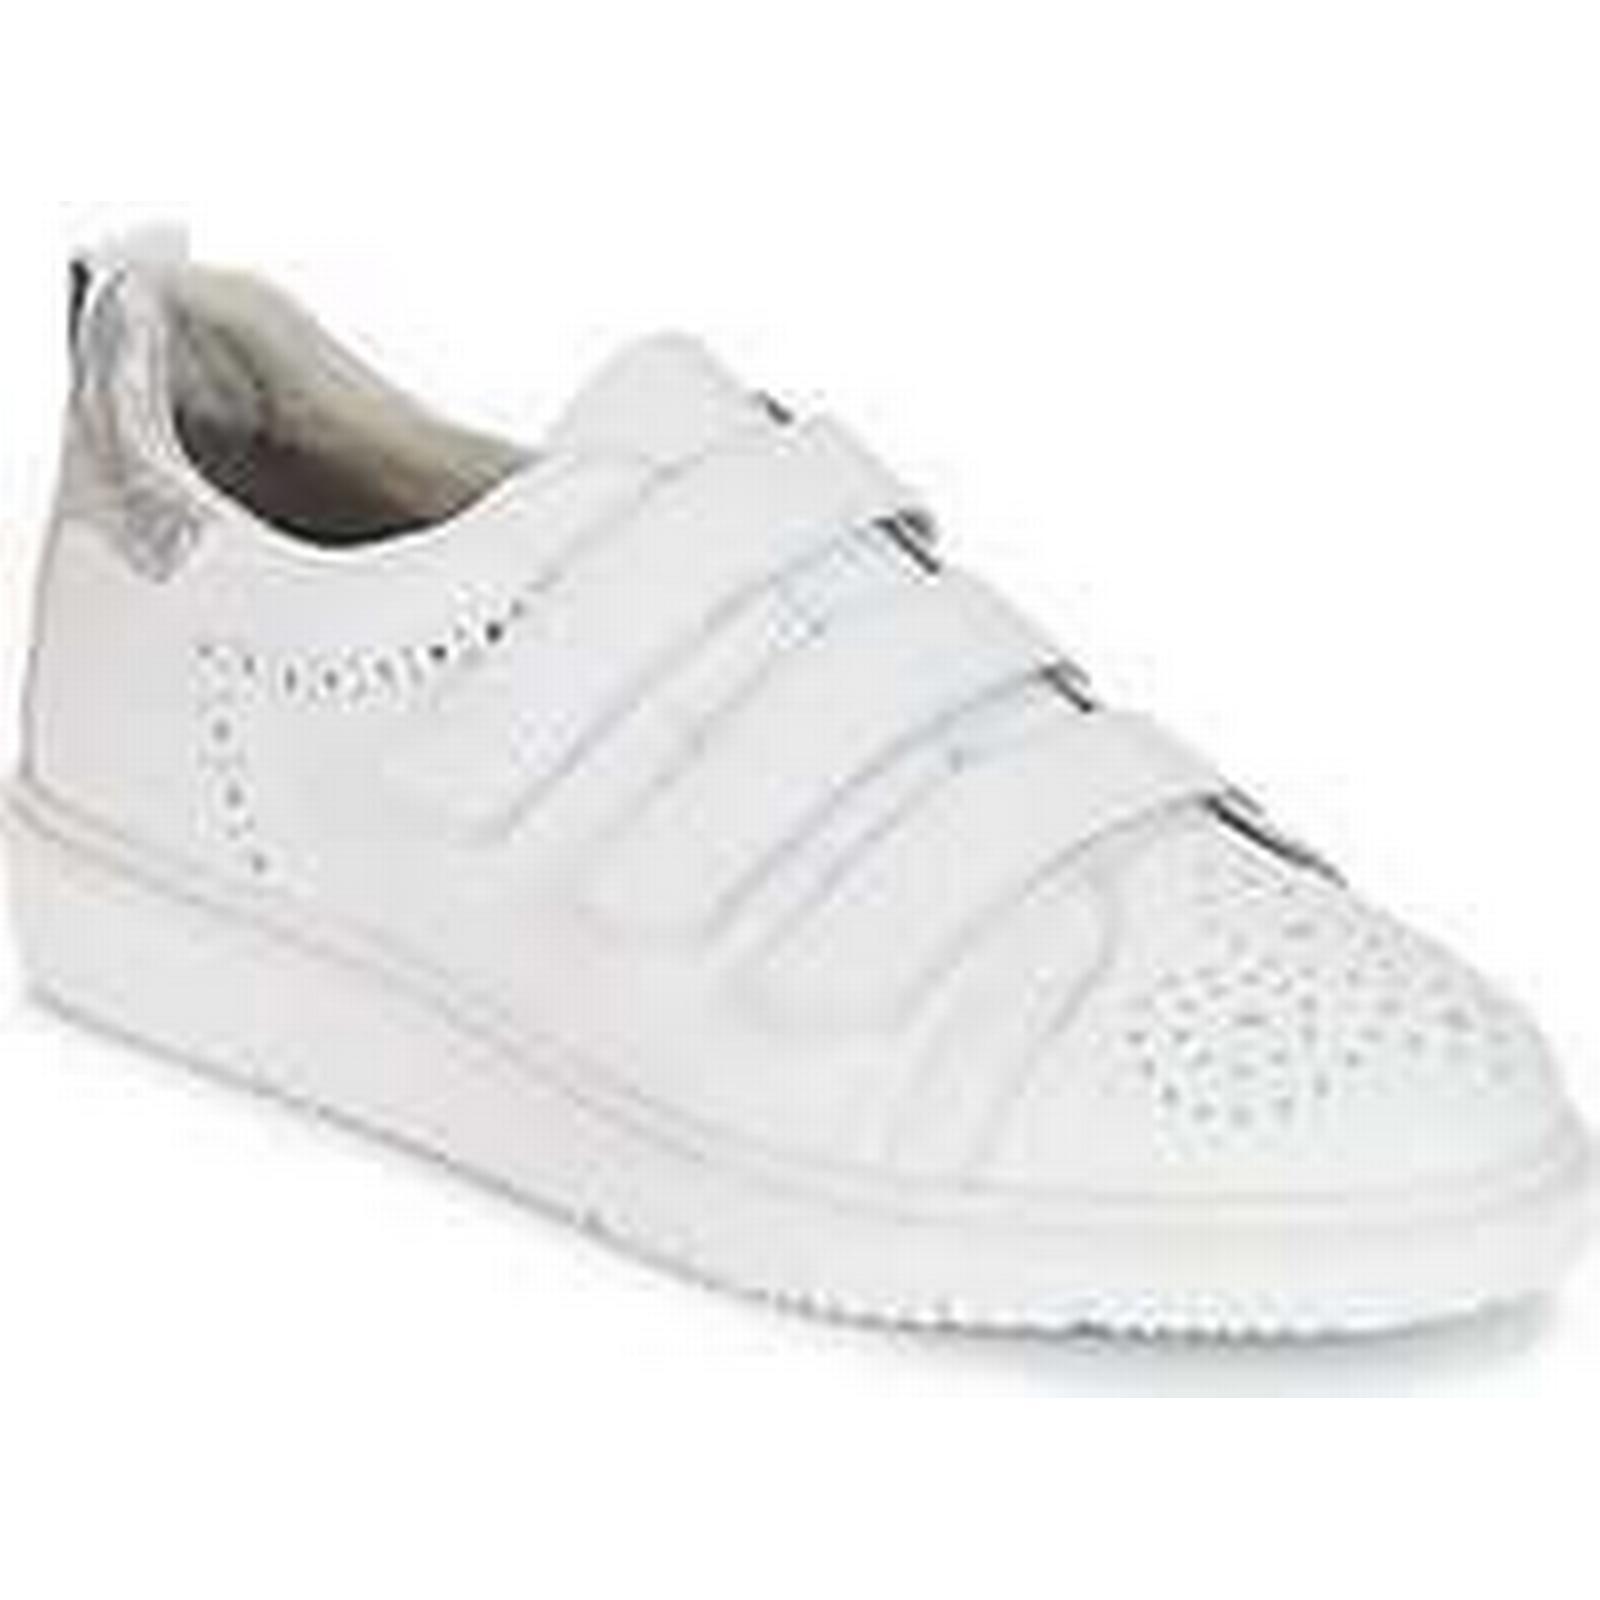 Spartoo.co.uk Tamaris in - women's Shoes (Trainers) in Tamaris White 438587